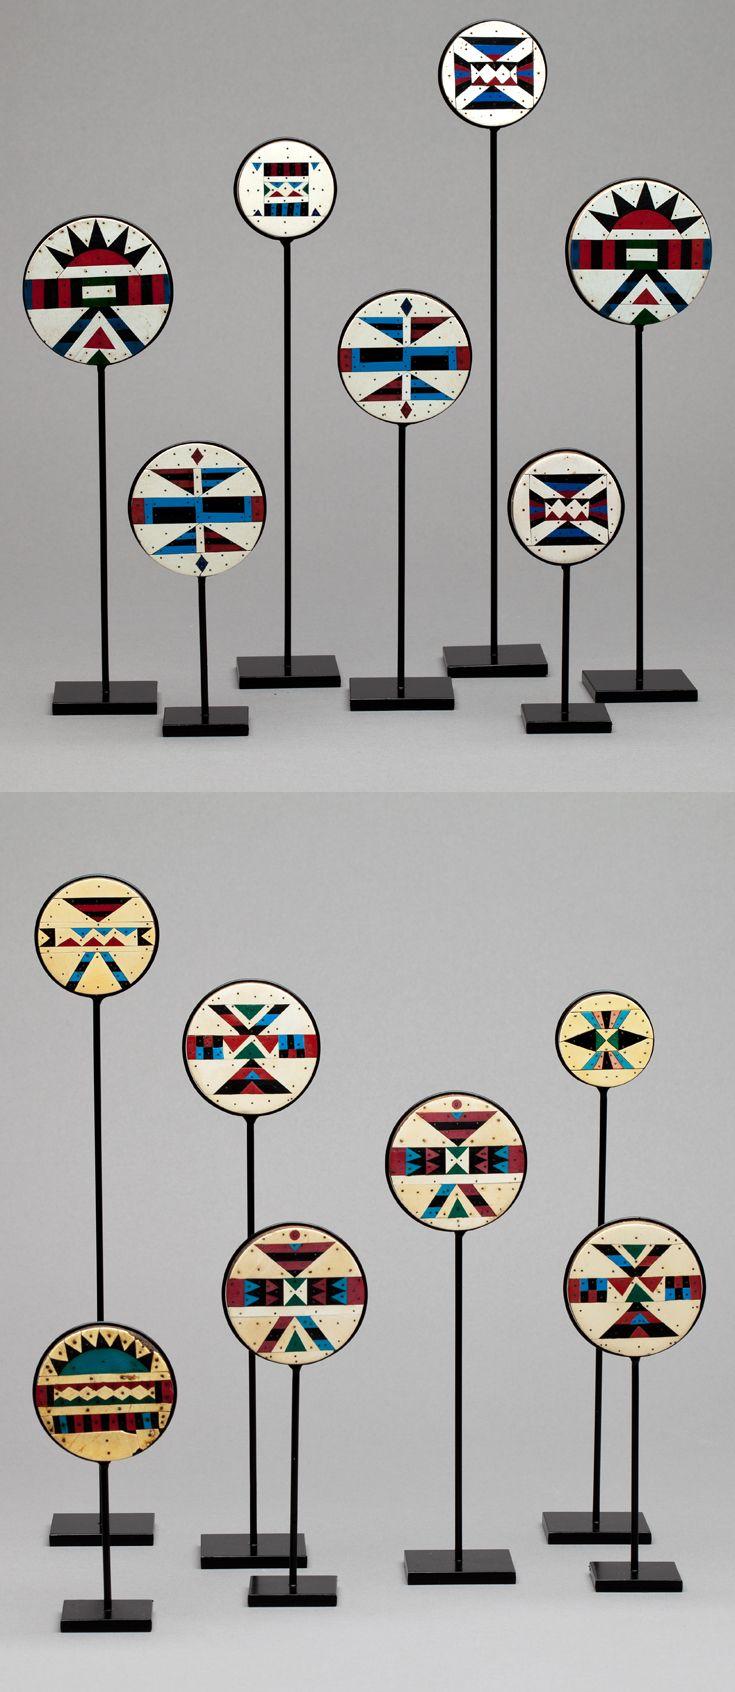 Africa Collection Of Kwazulu Earplugs From South Africa Ca 1950s The Earplugs Are Made From A South African Sof In 2020 African Art Art African